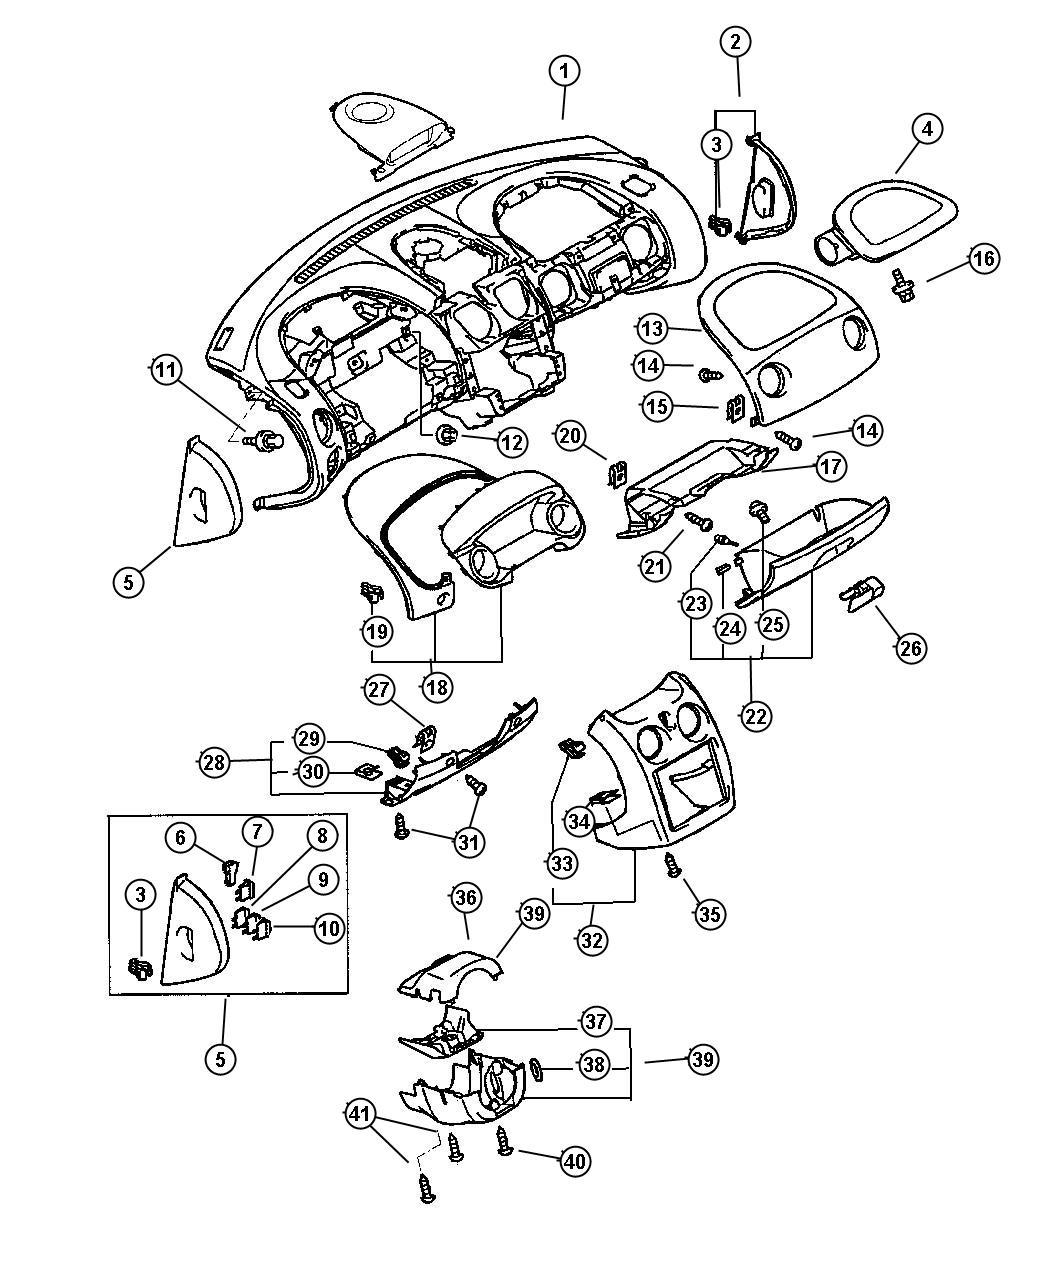 2002 Chrysler Sebring Fuse. Mini. 10 amp, red. Electrical ...